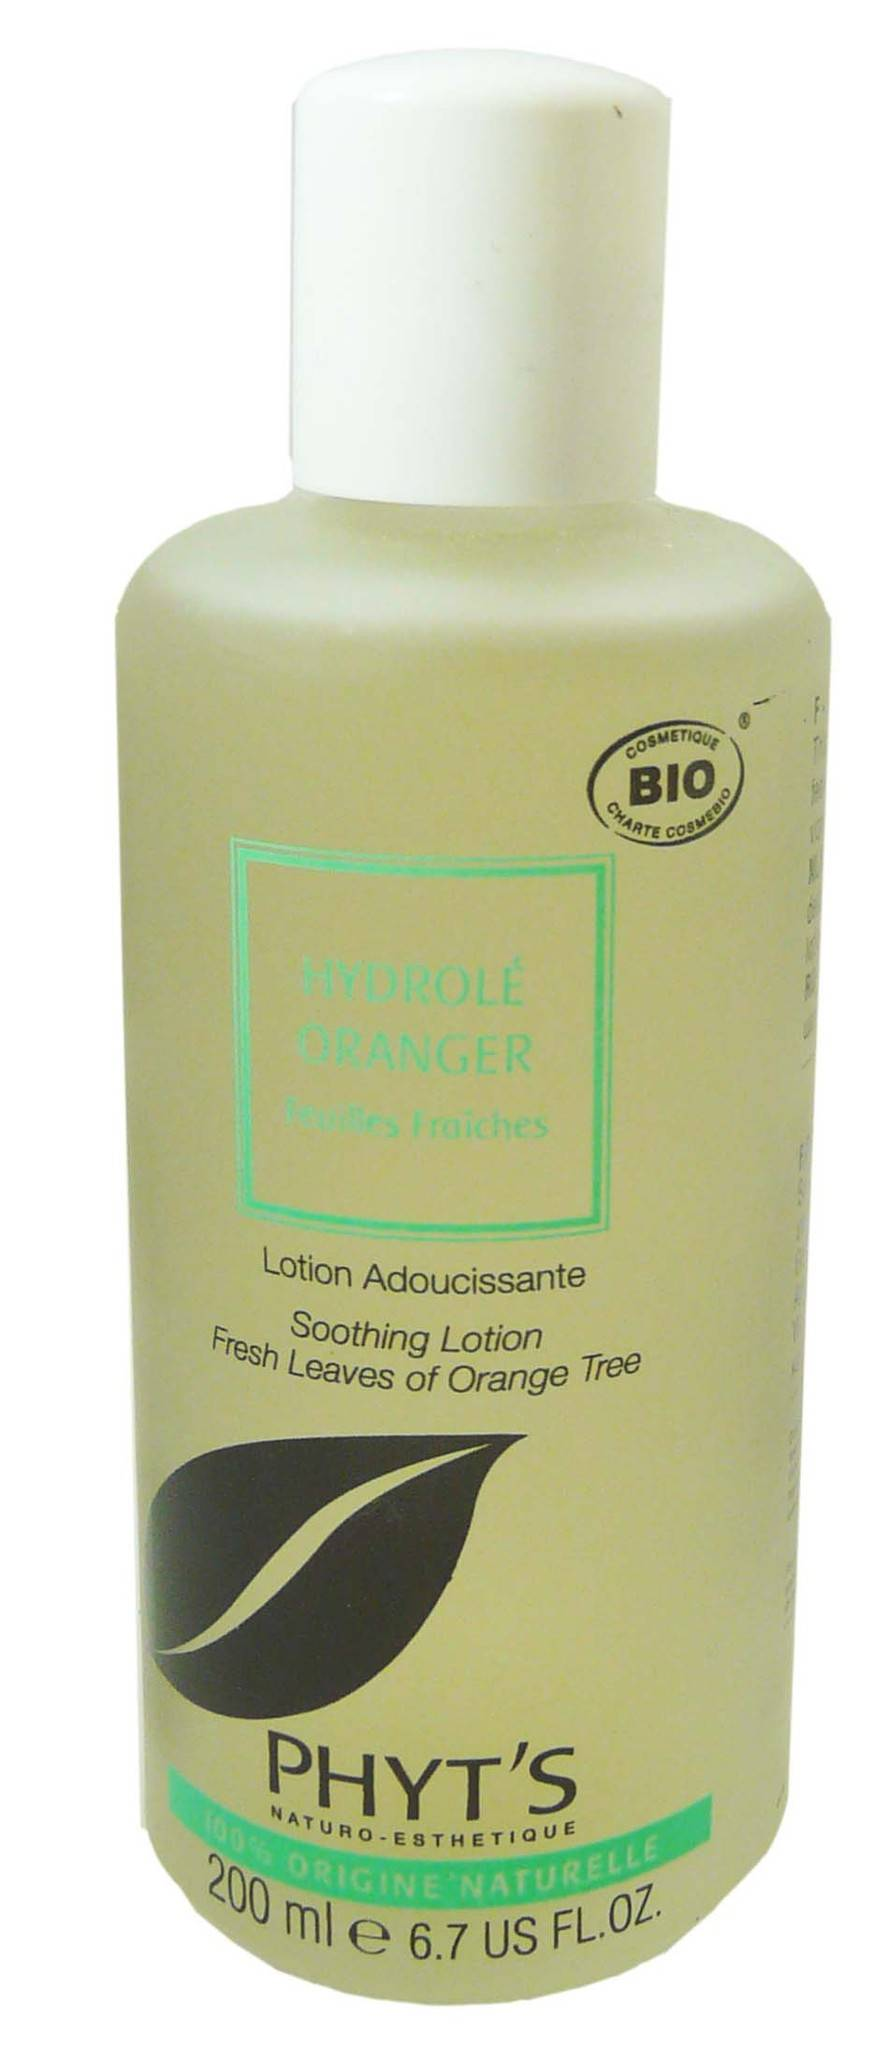 Phyt's hydrole oranger lotion adoucissante 200ml